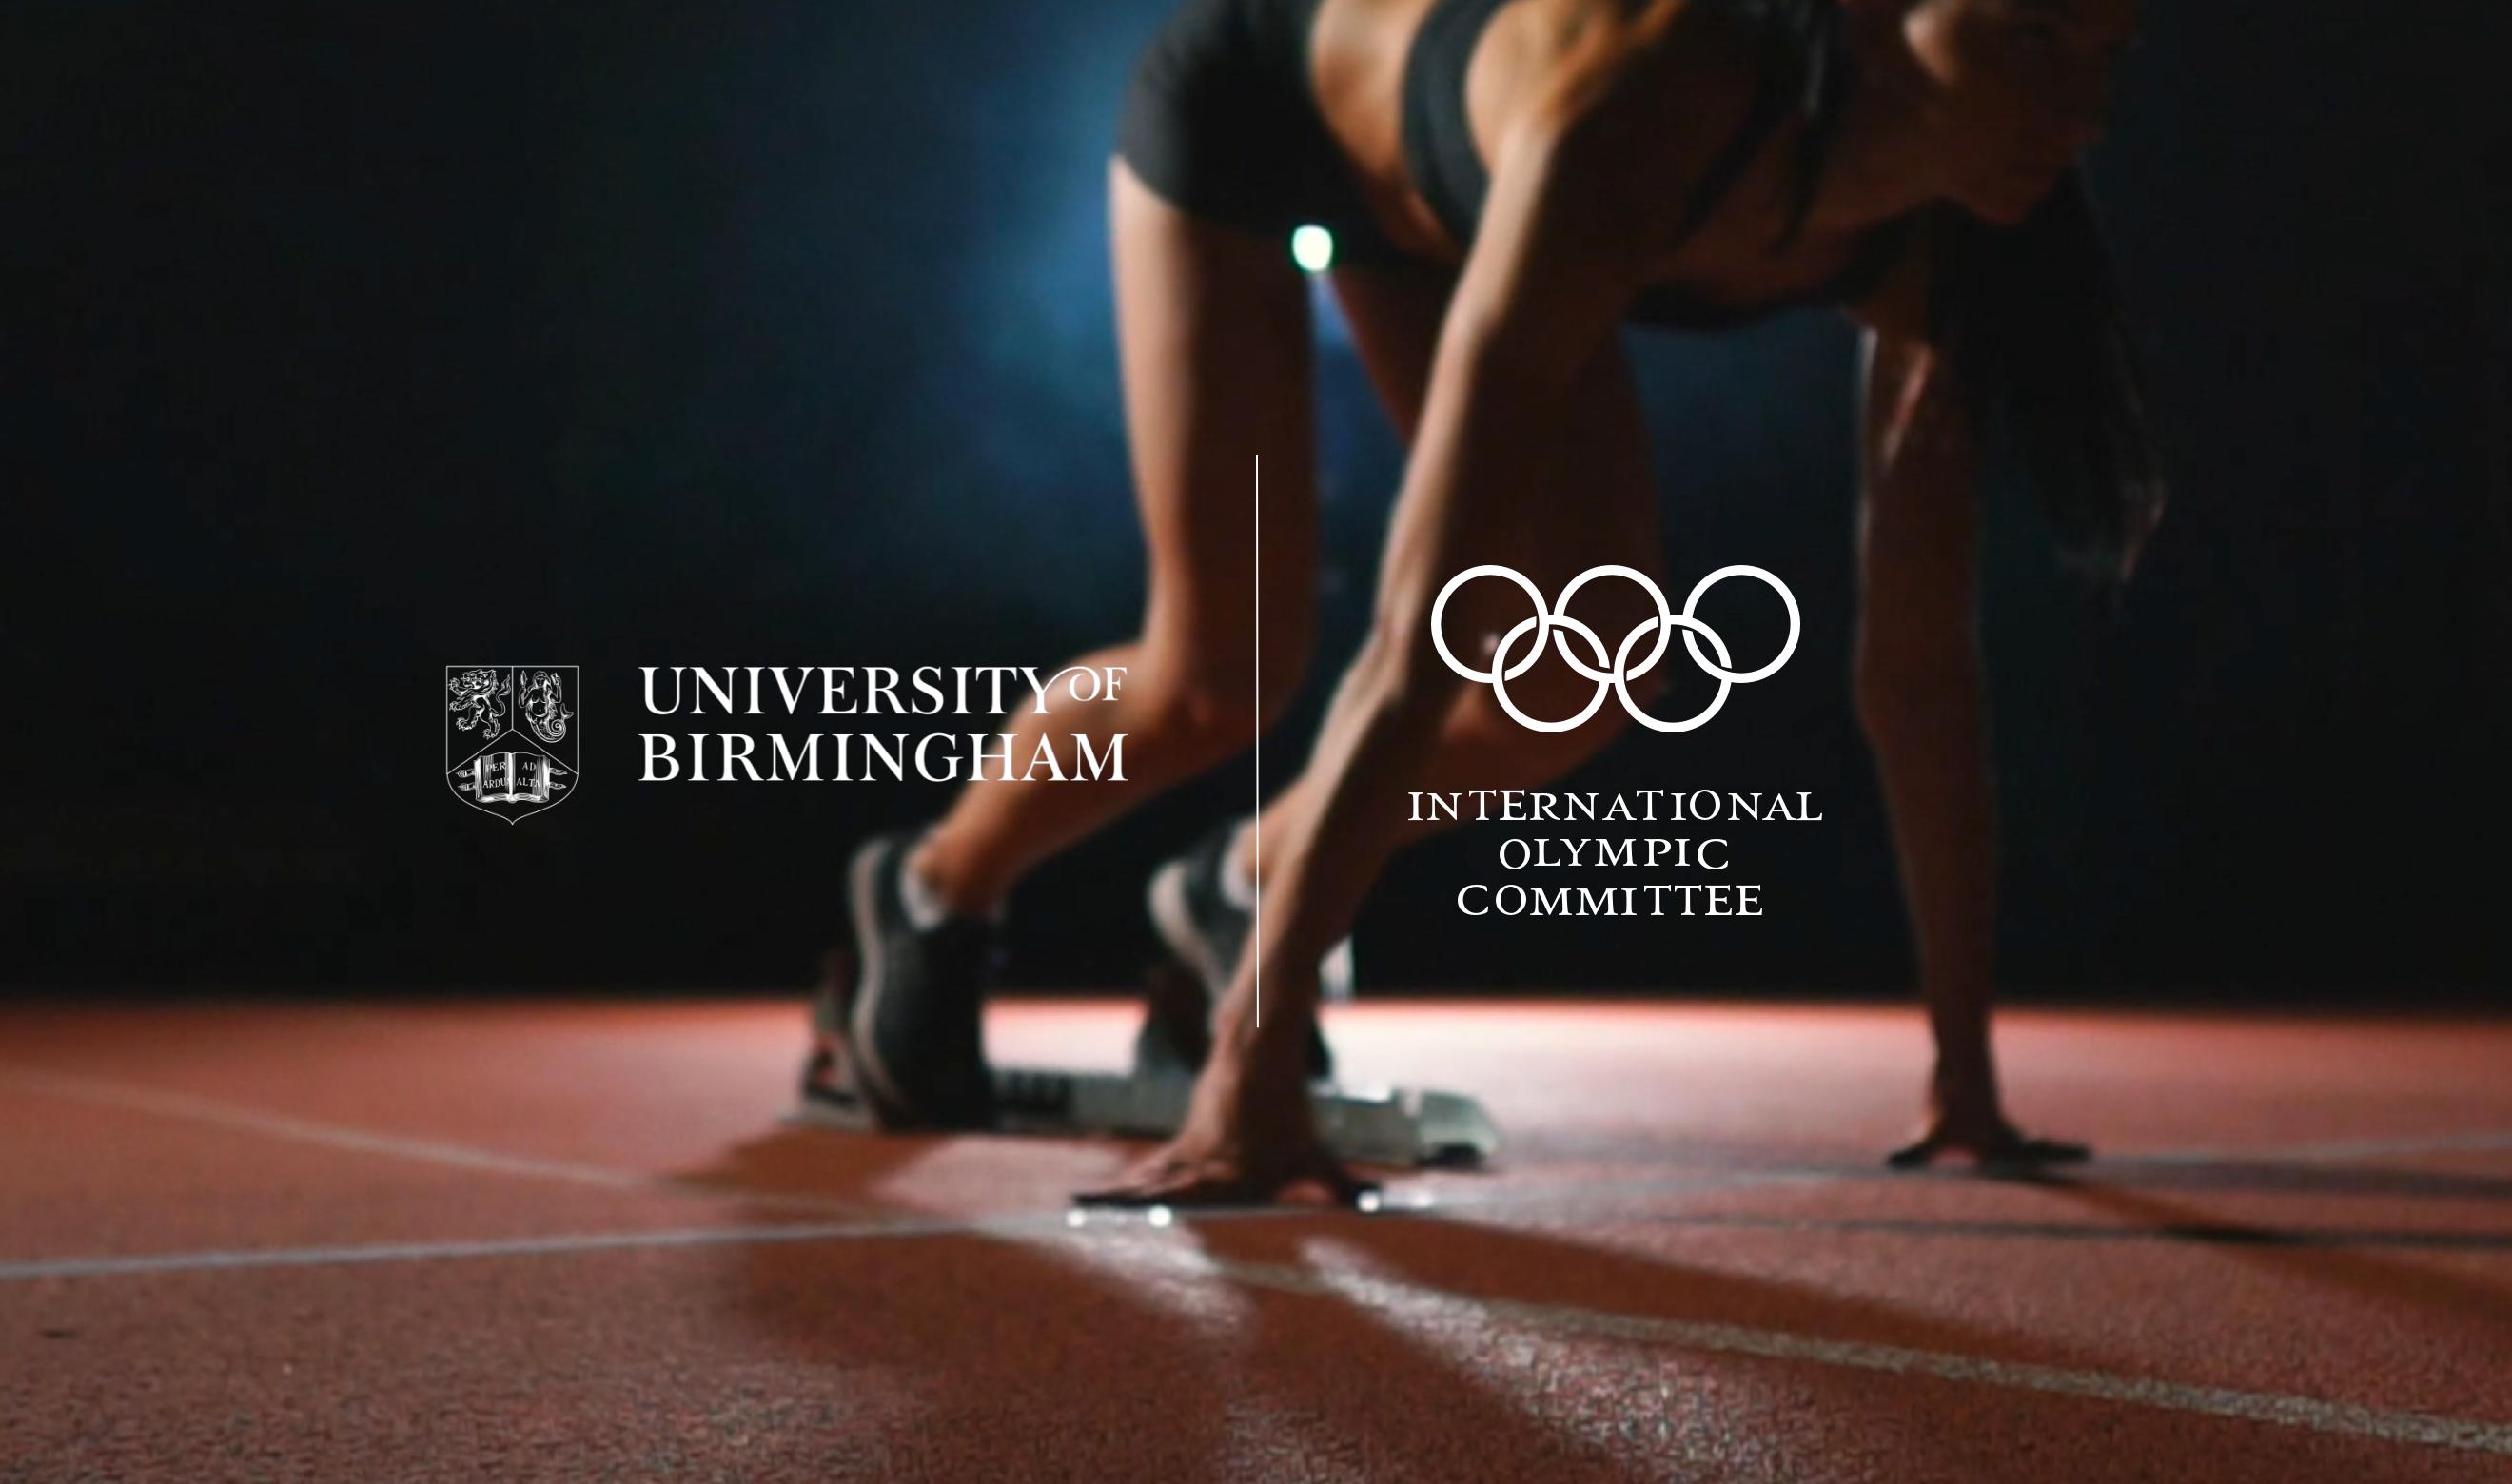 University of Birmingham Software